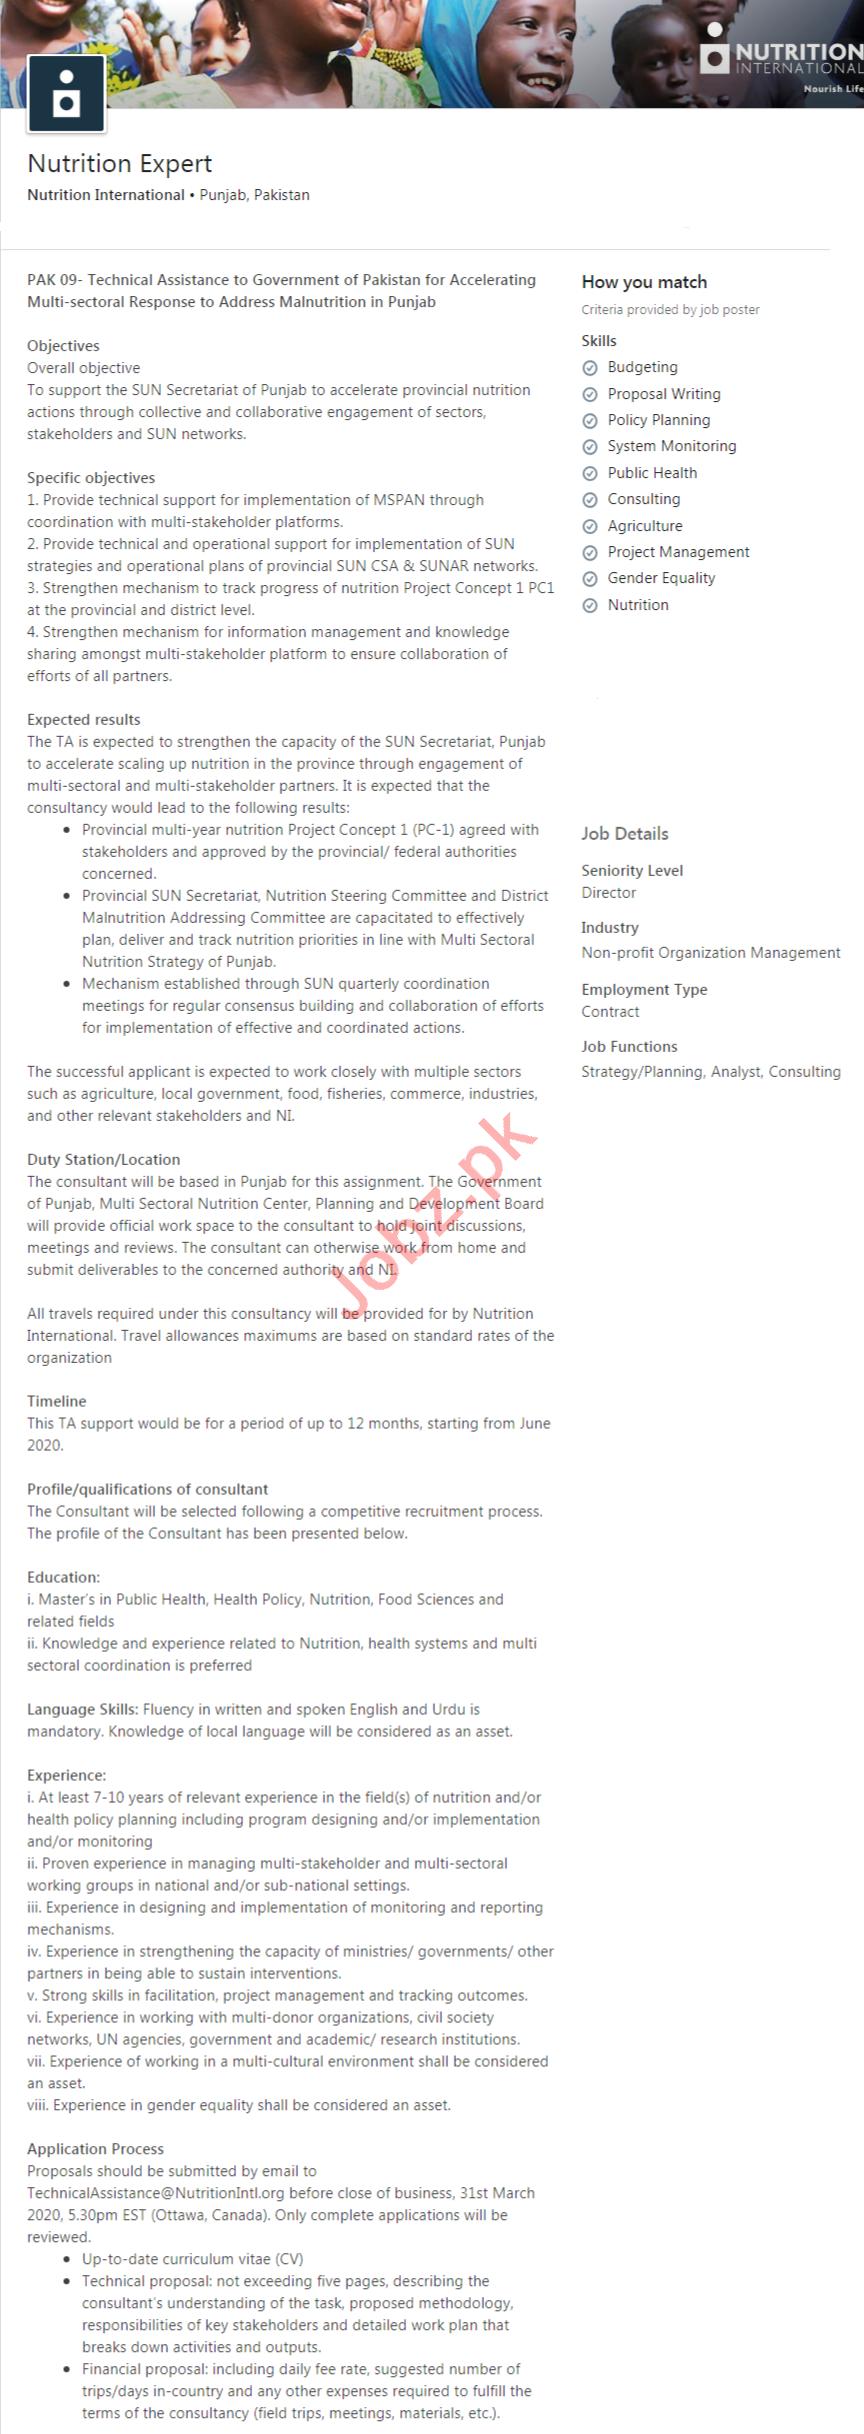 Nutrition International Pakistan Jobs 2020 Nutrition Expert